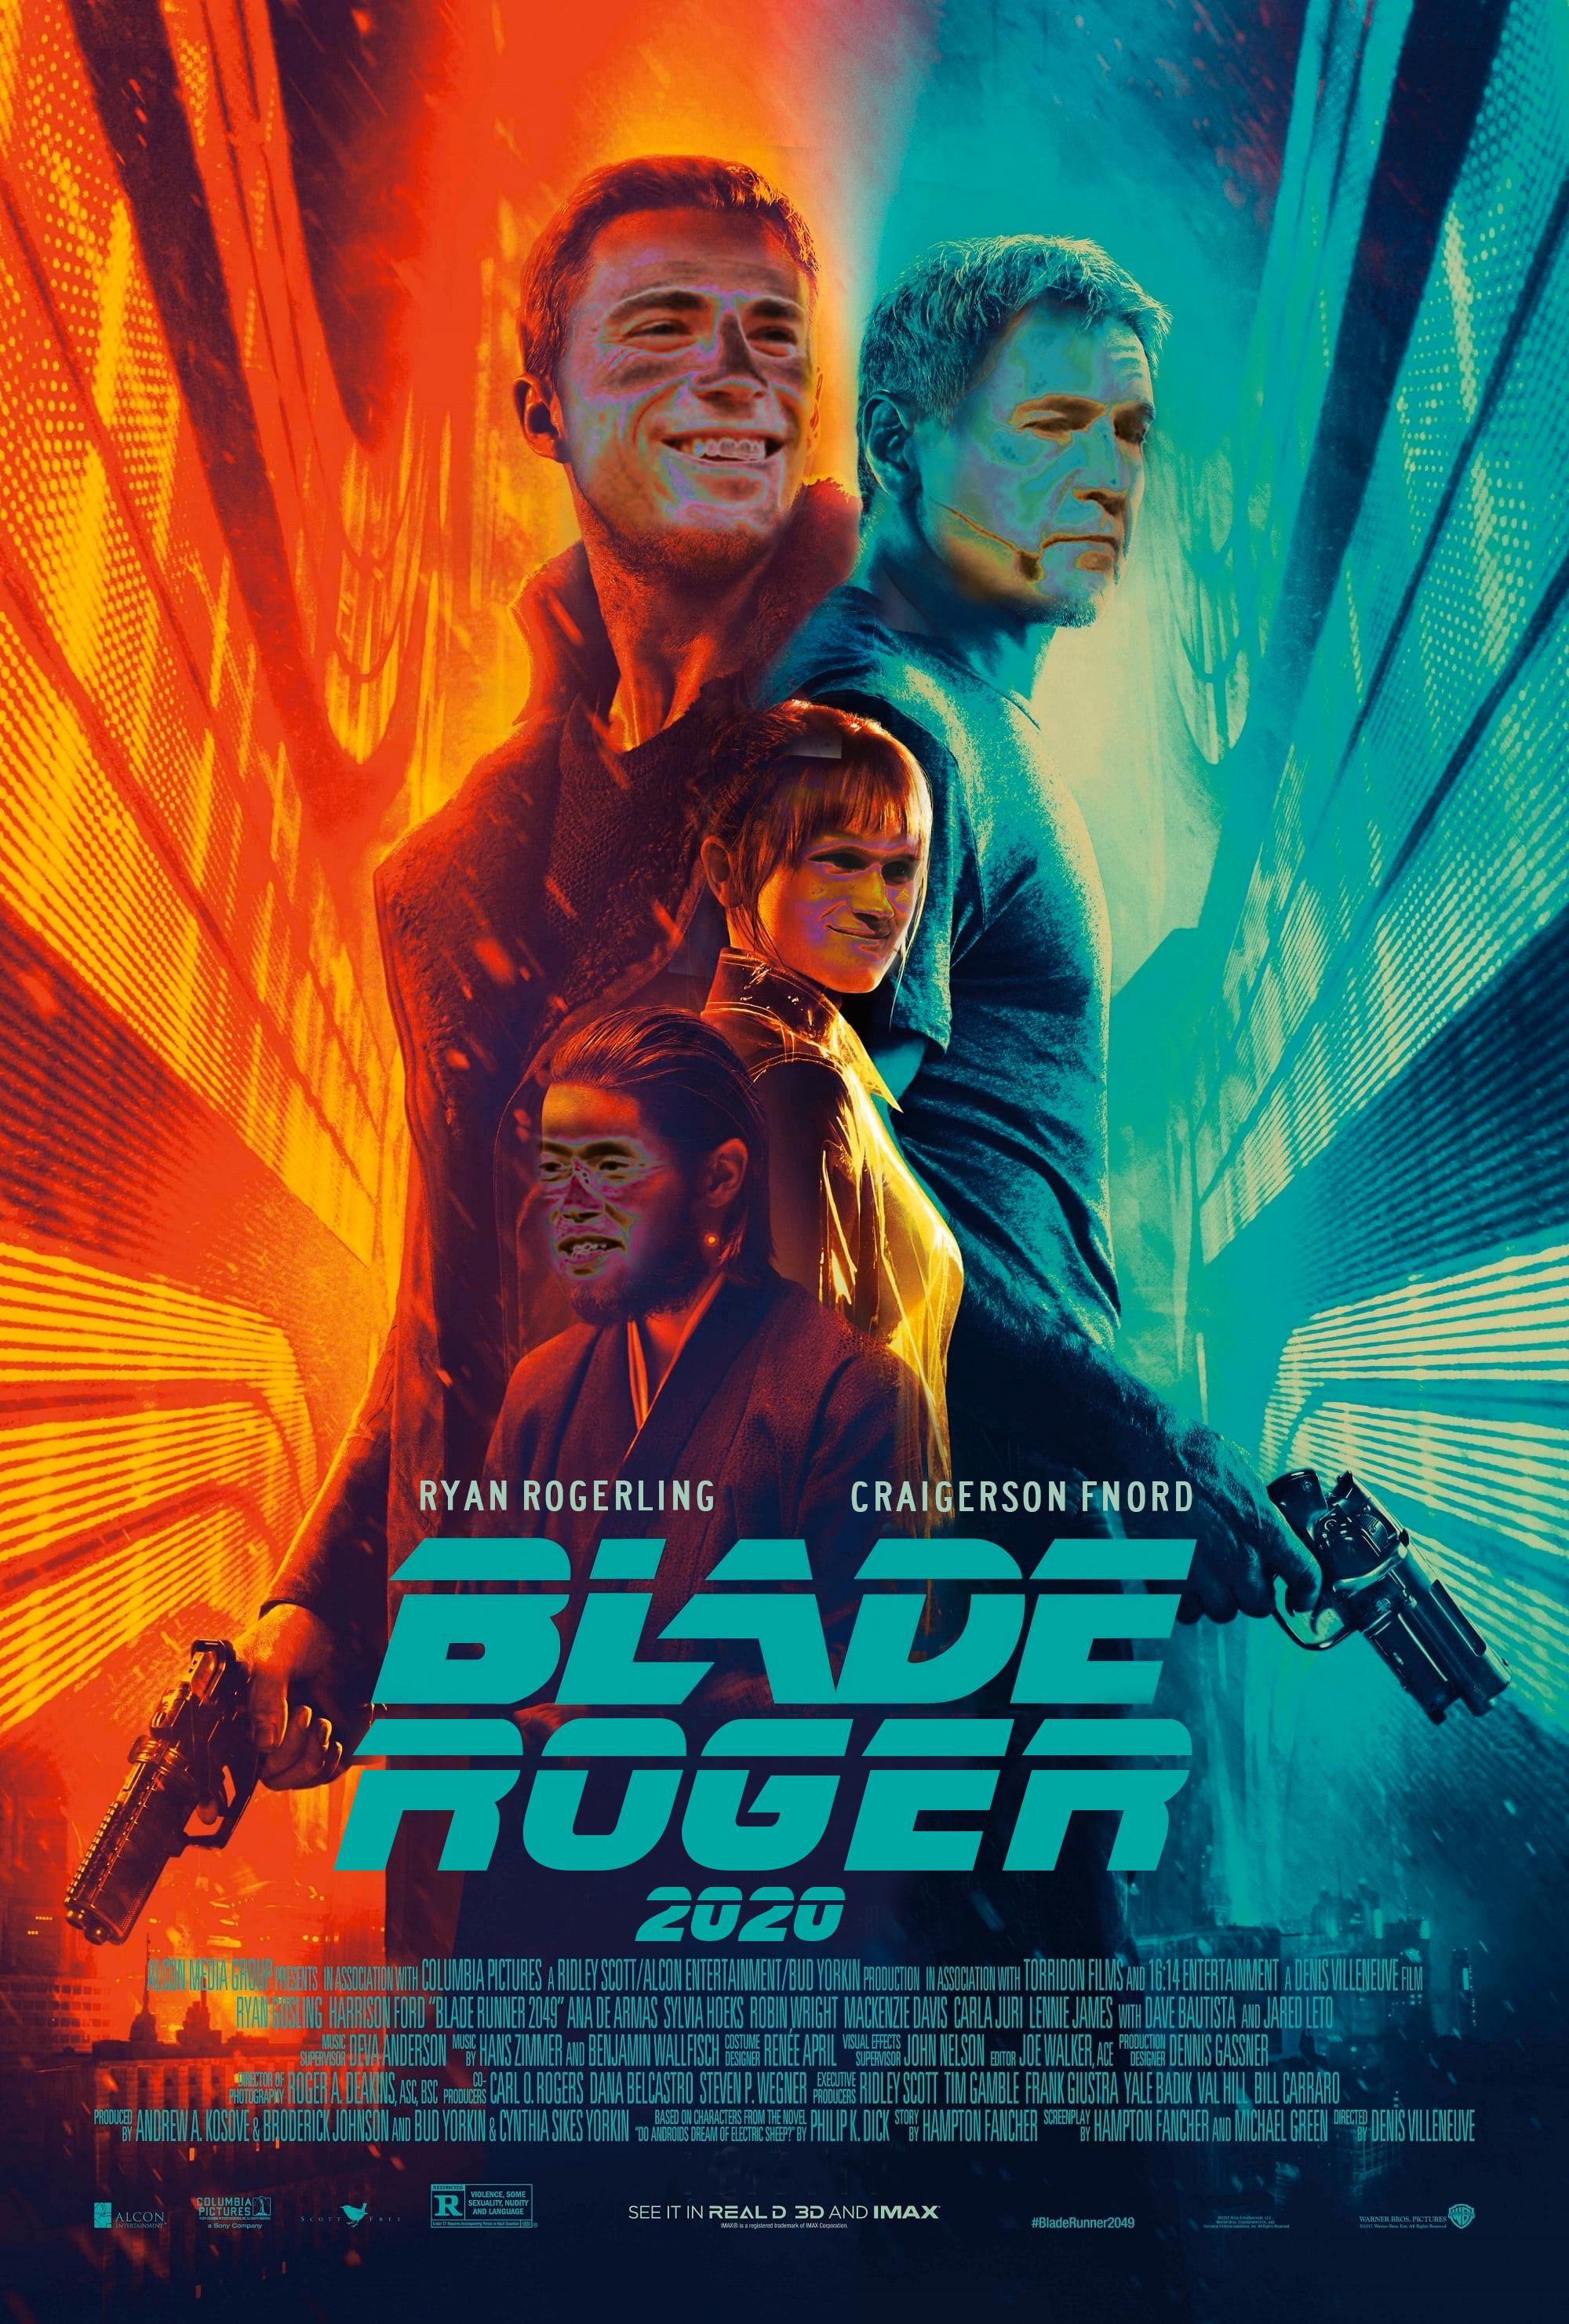 Blade Roger